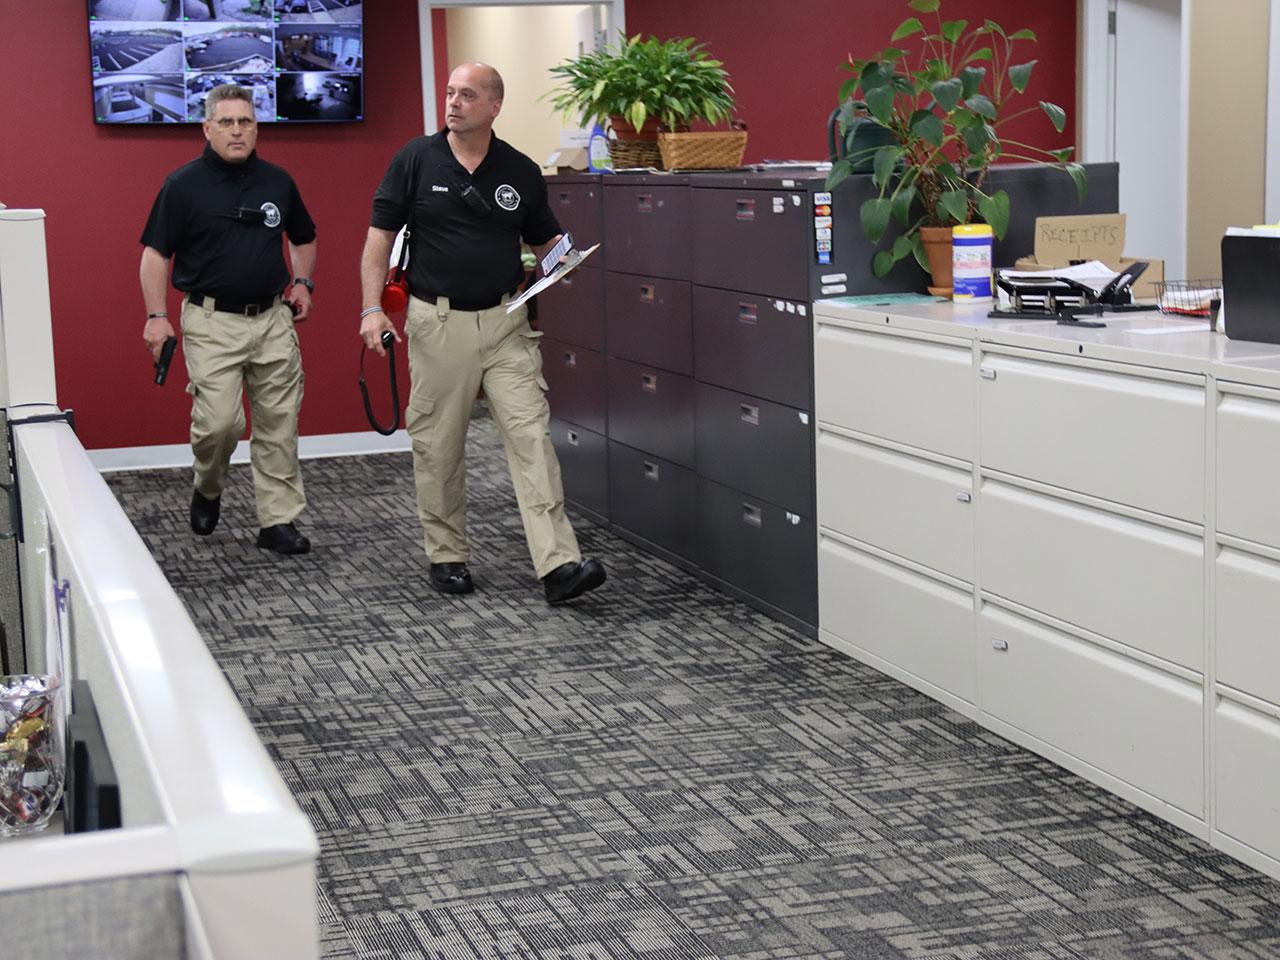 active shooter practice shooter walks around office